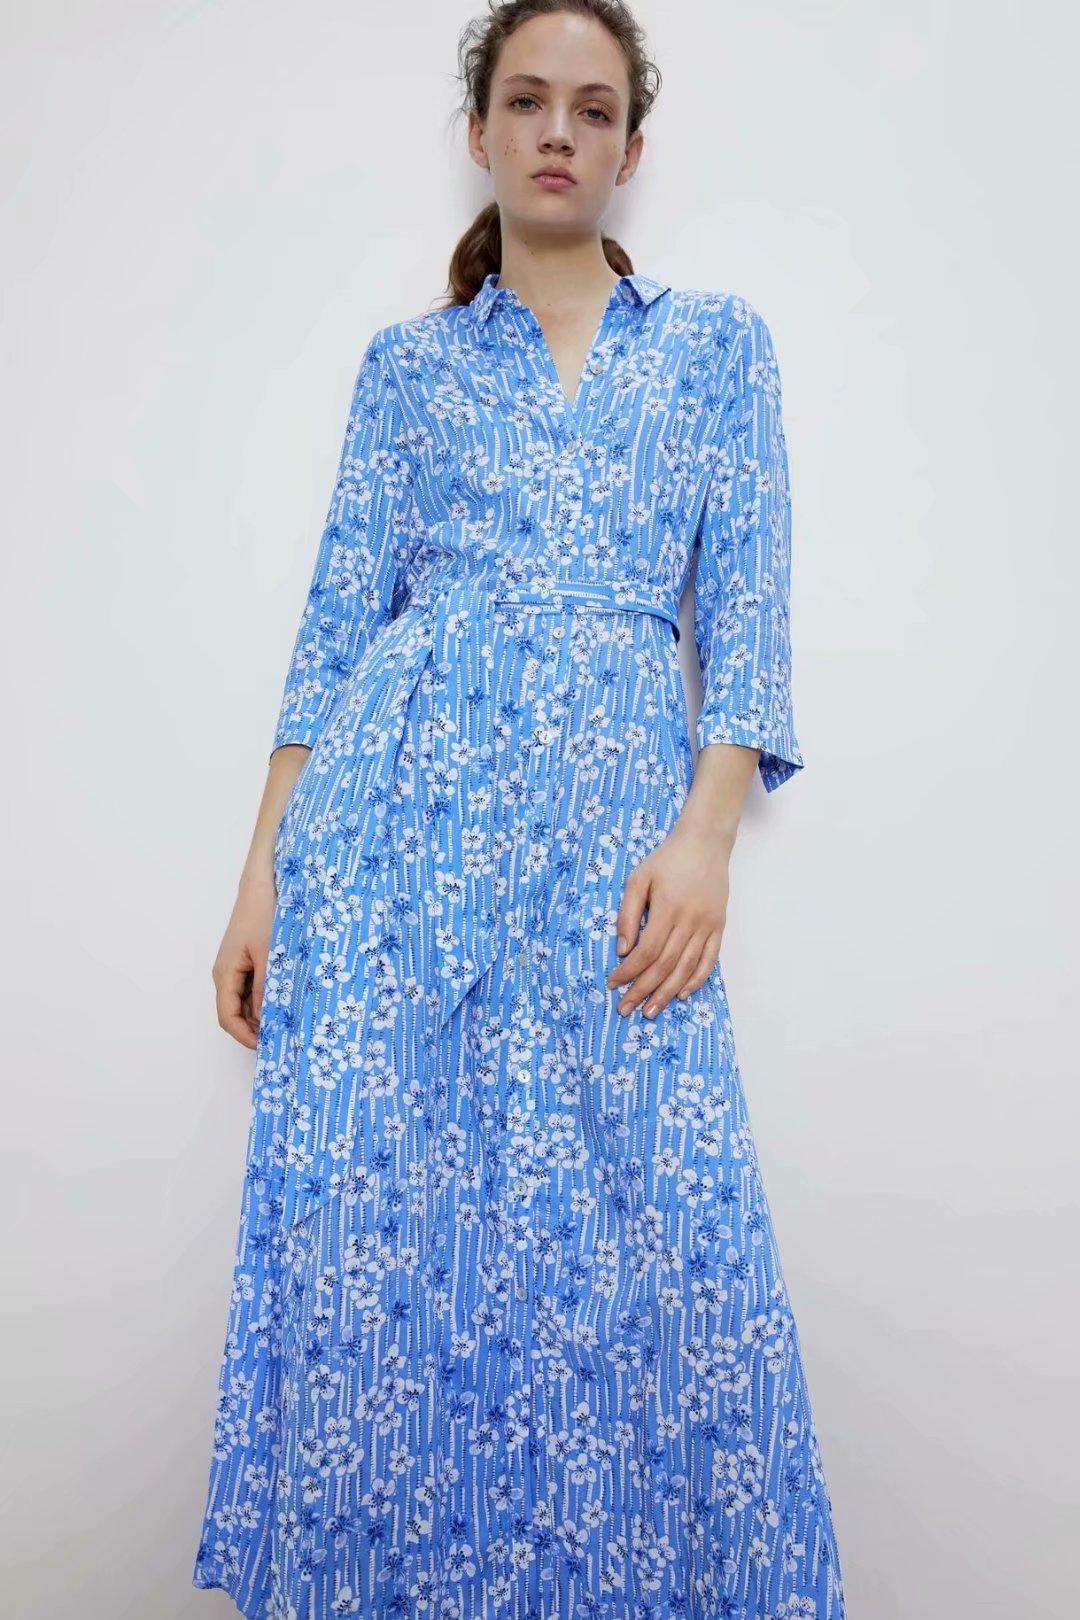 2020 New Spring Summer New Style European Flower Floral Printed Female Dress Zaraing Vadiming Sheining Women's Blue Print Dress